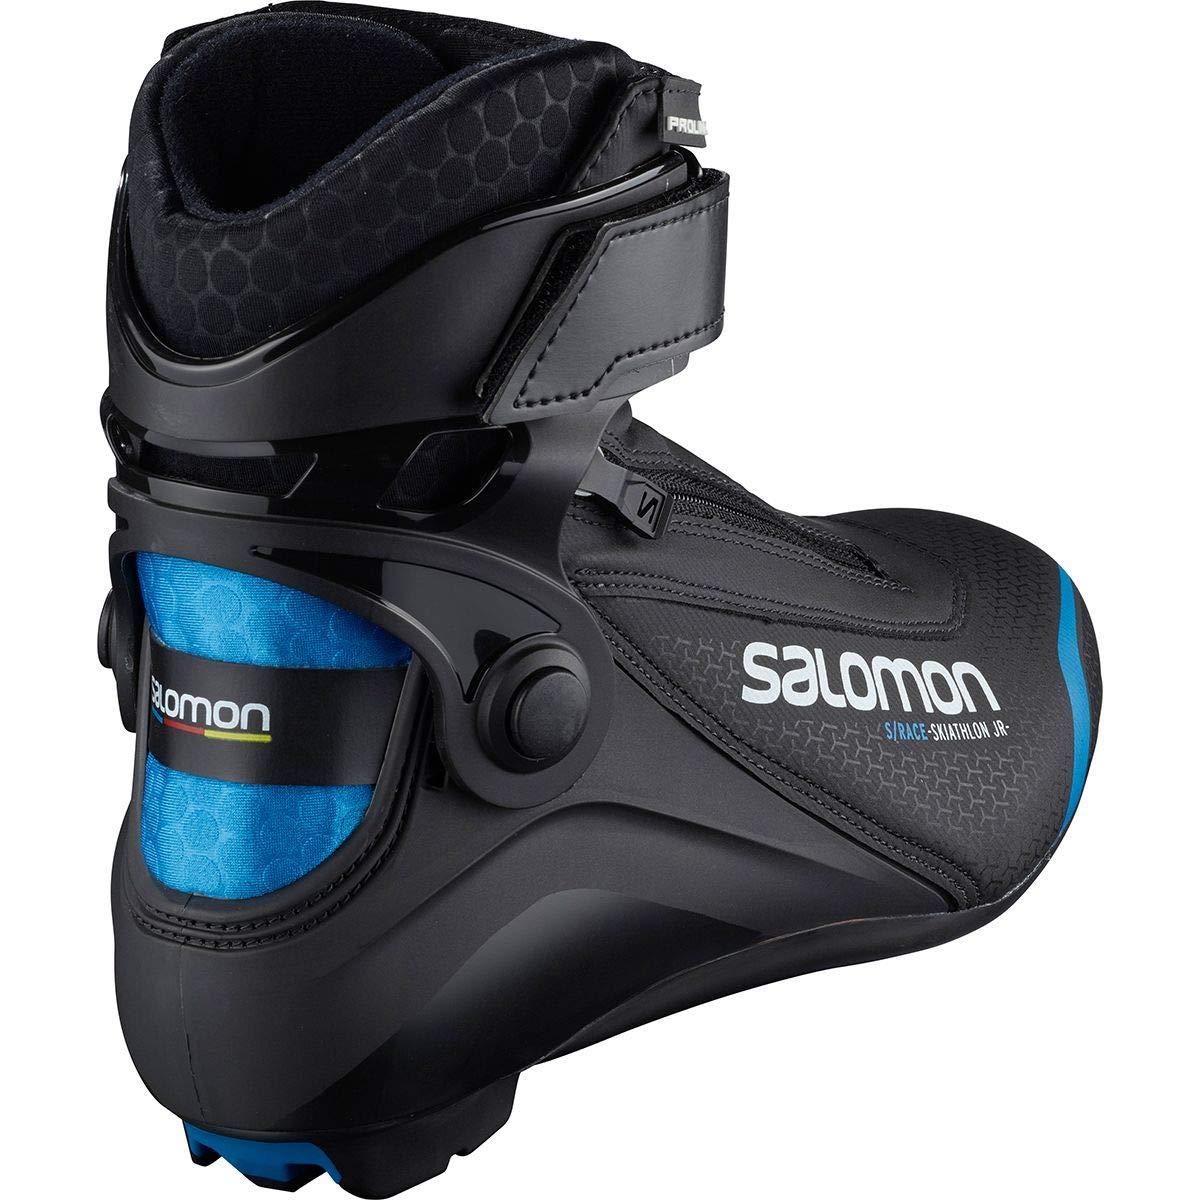 SALOMON Kinder S-Race Skiathlon Combischuh Langlaufschuhe NEU